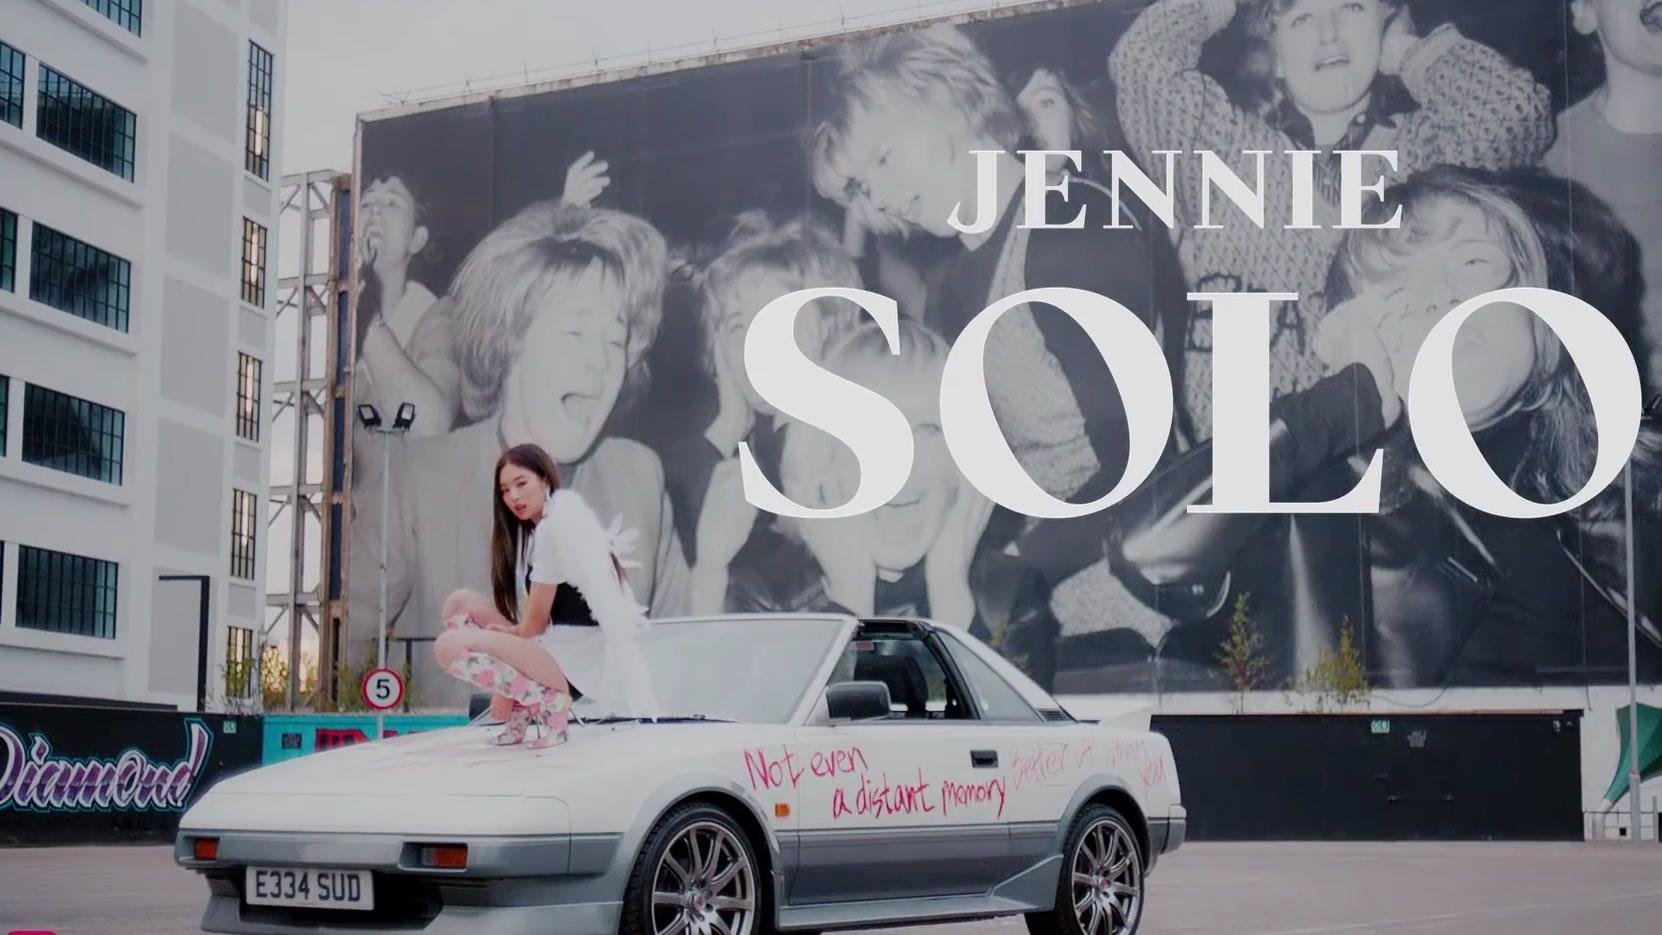 SOLO - JENNIE